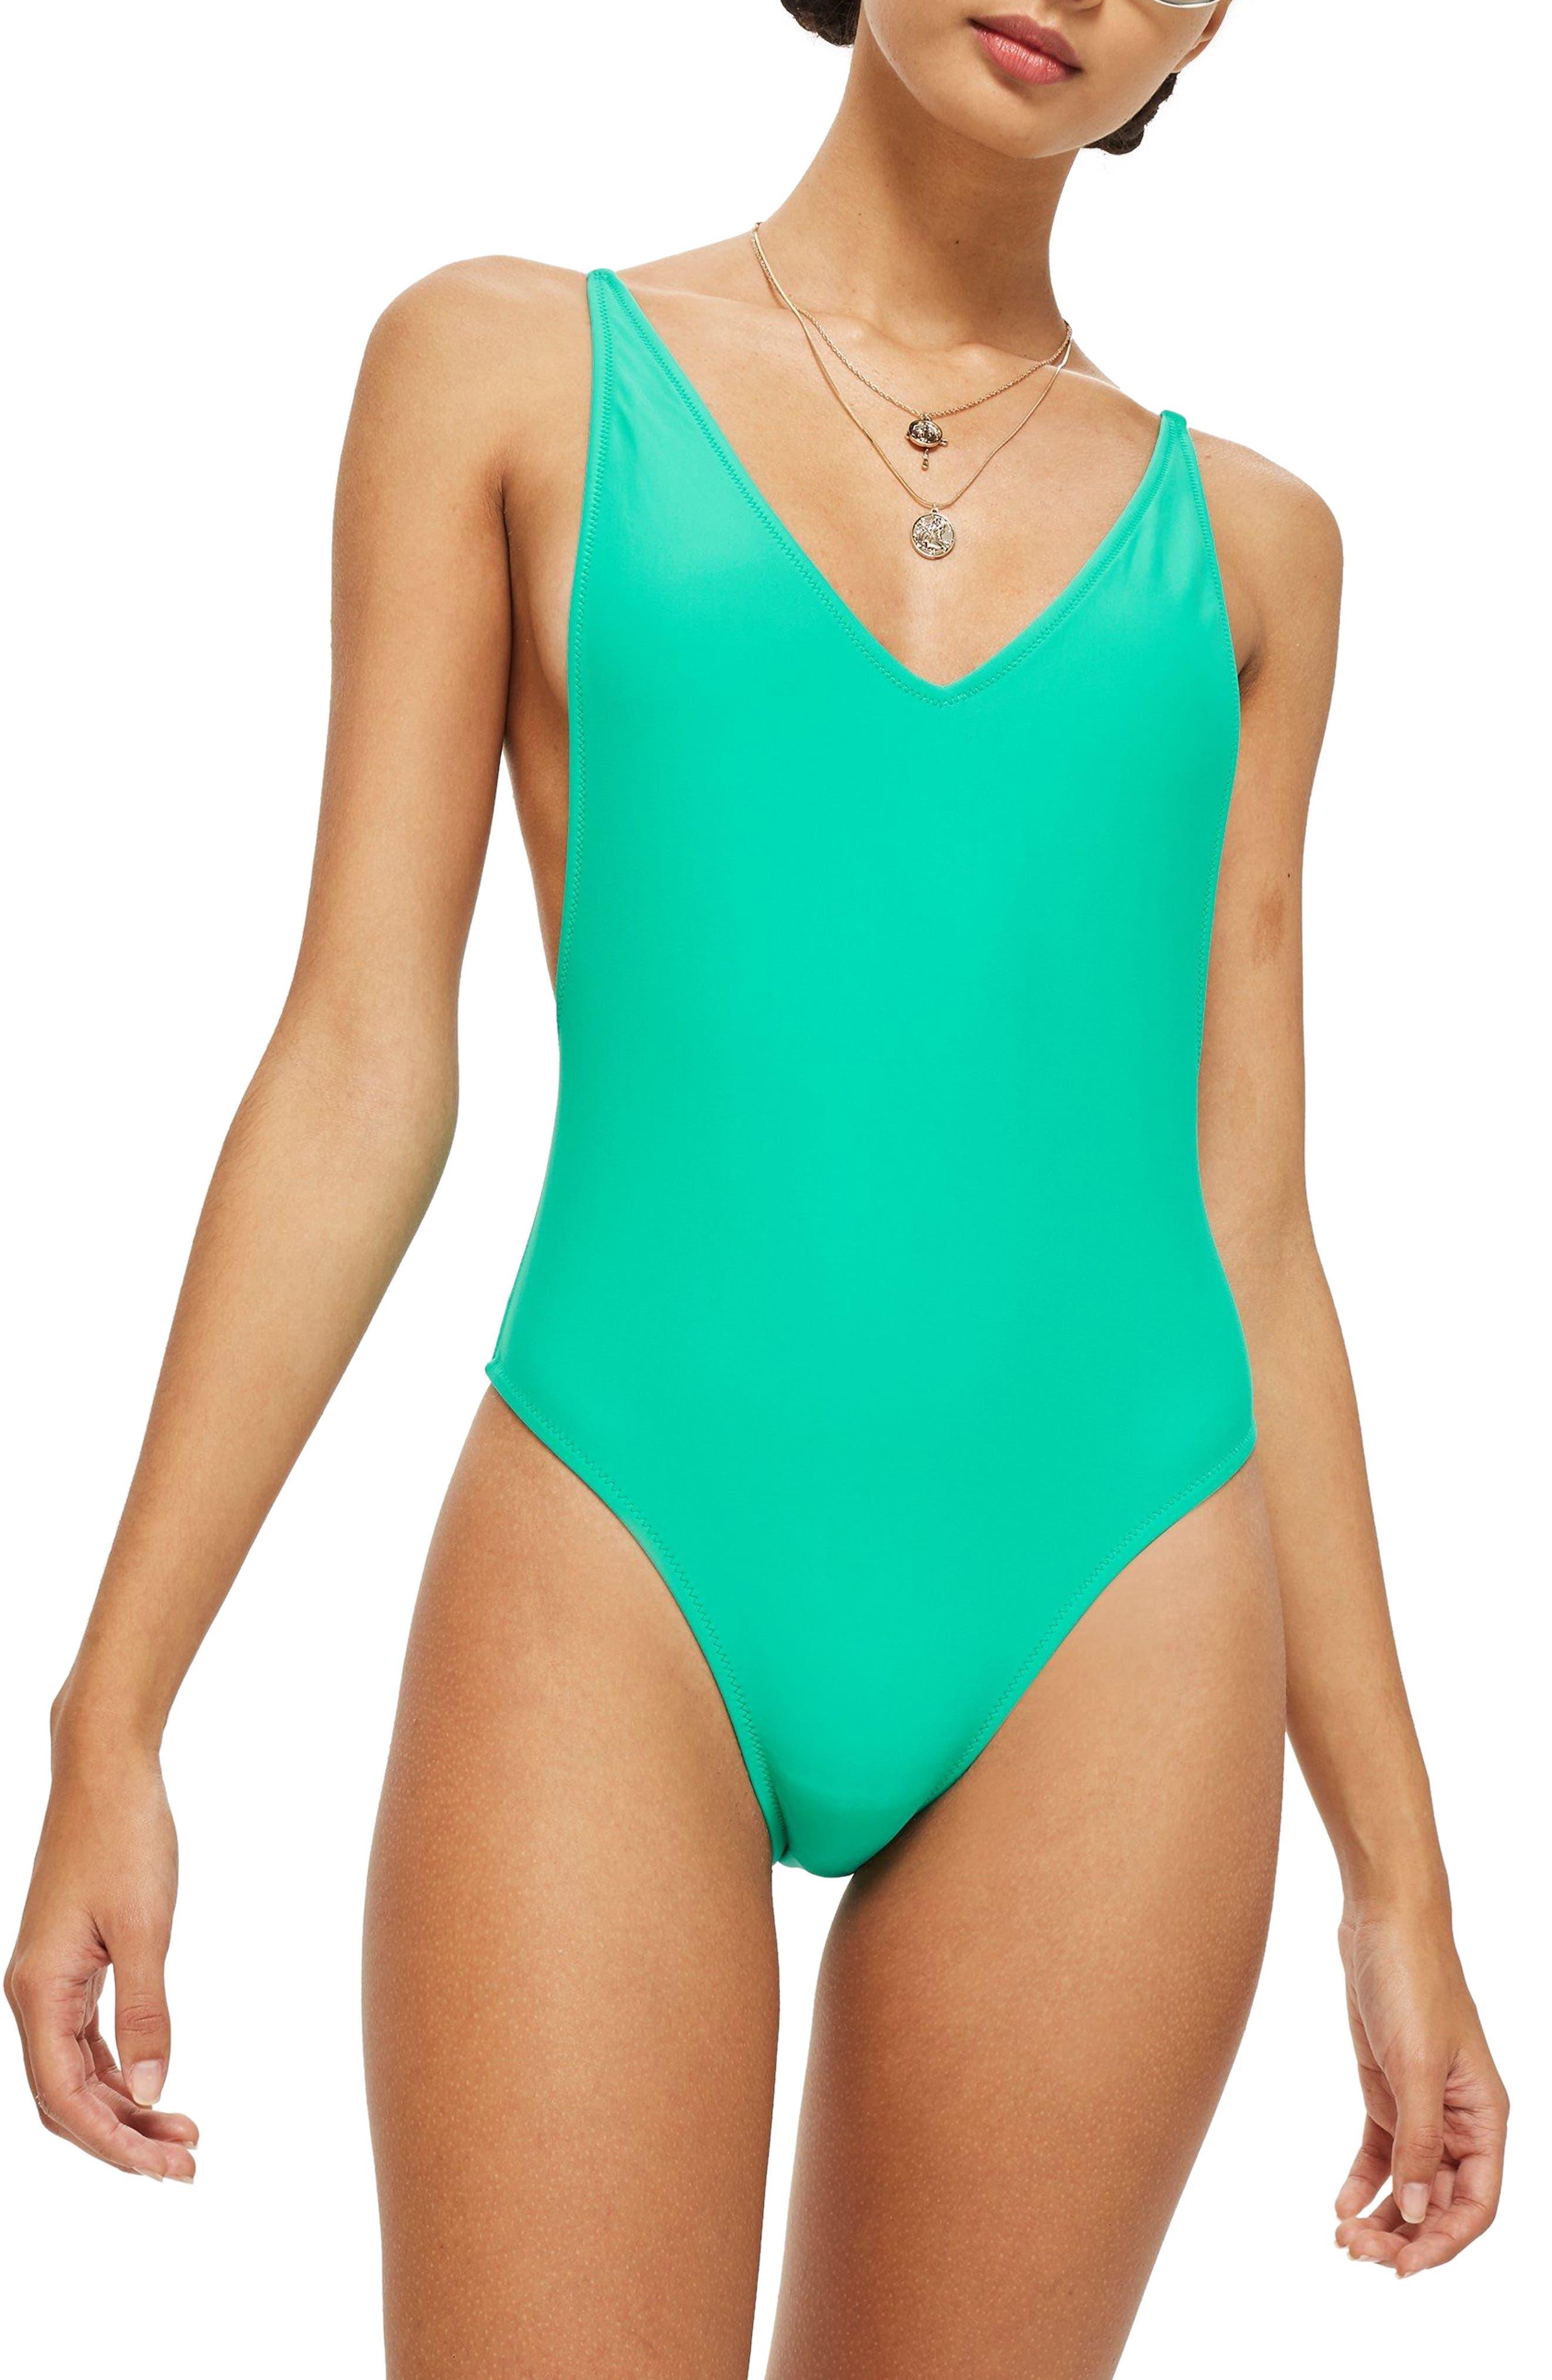 Pamela One-Piece Swimsuit,                             Main thumbnail 1, color,                             TEAL